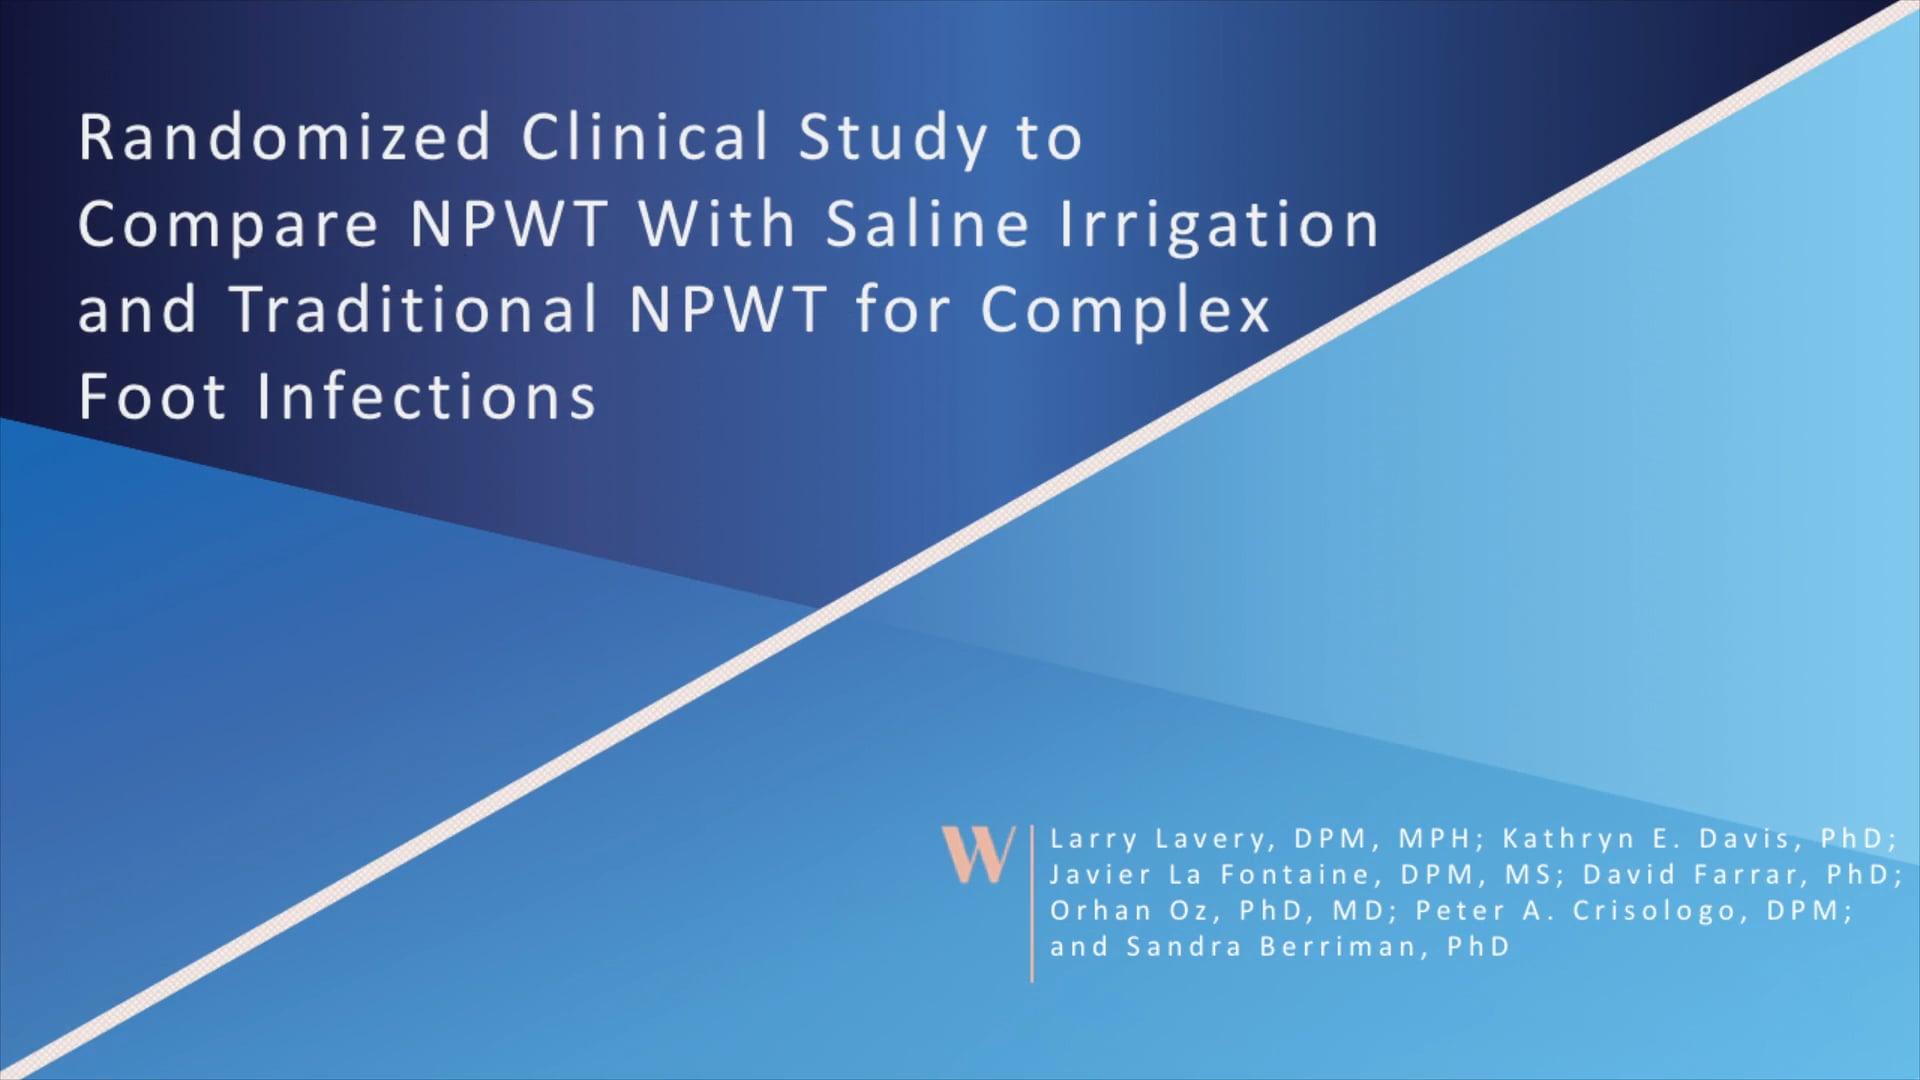 Cardinal Health™ NPWT: Randomized Clinical Study